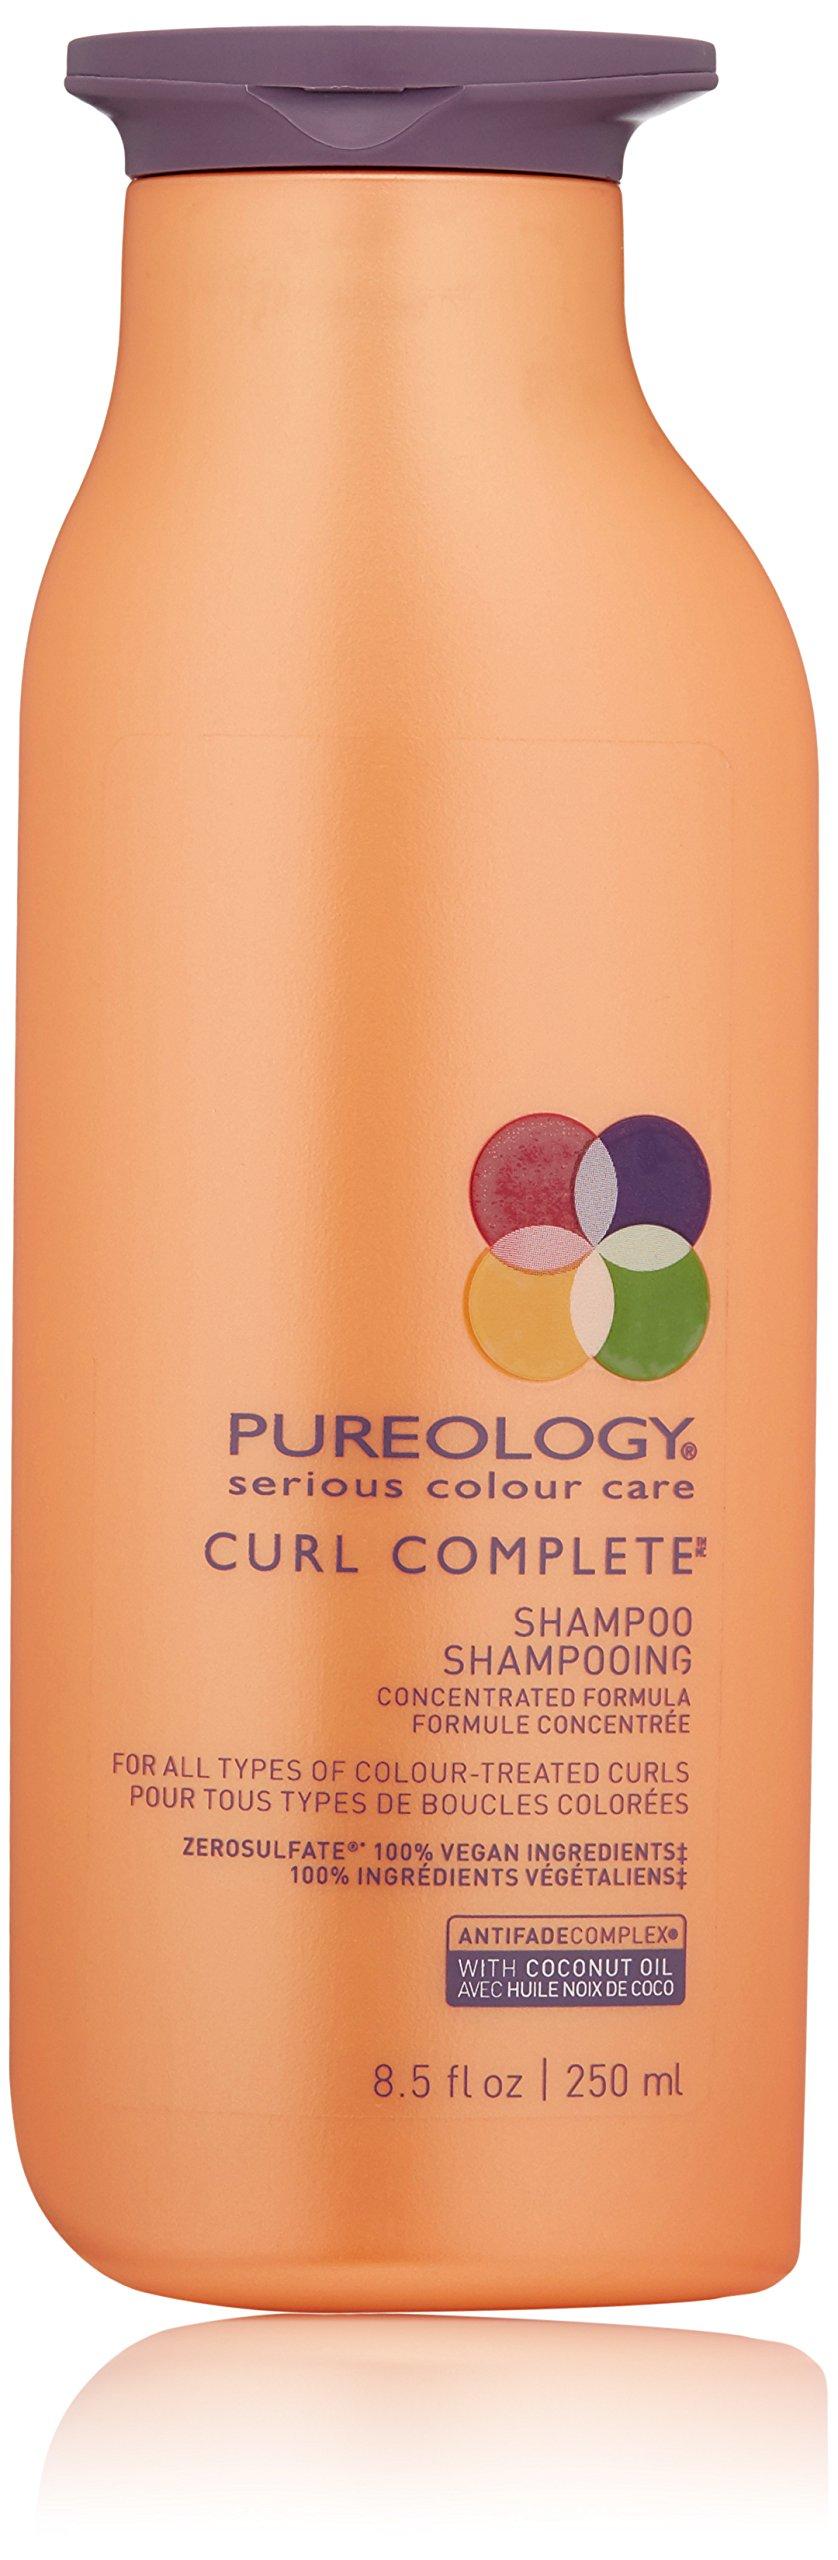 Pureology Curl Complete Shampoo, 8.5 Fl Oz